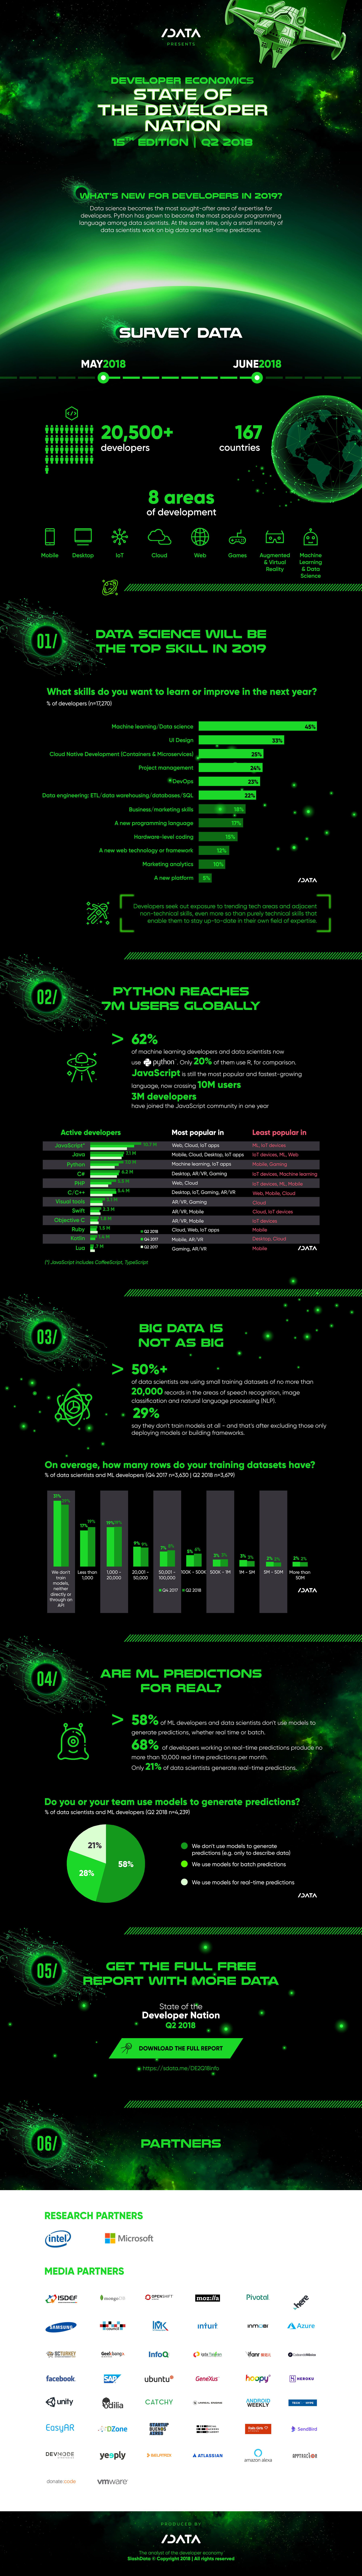 State of the Developer Nation 15 edition, developer economics, developer survey, slashdata, developer research, infographic